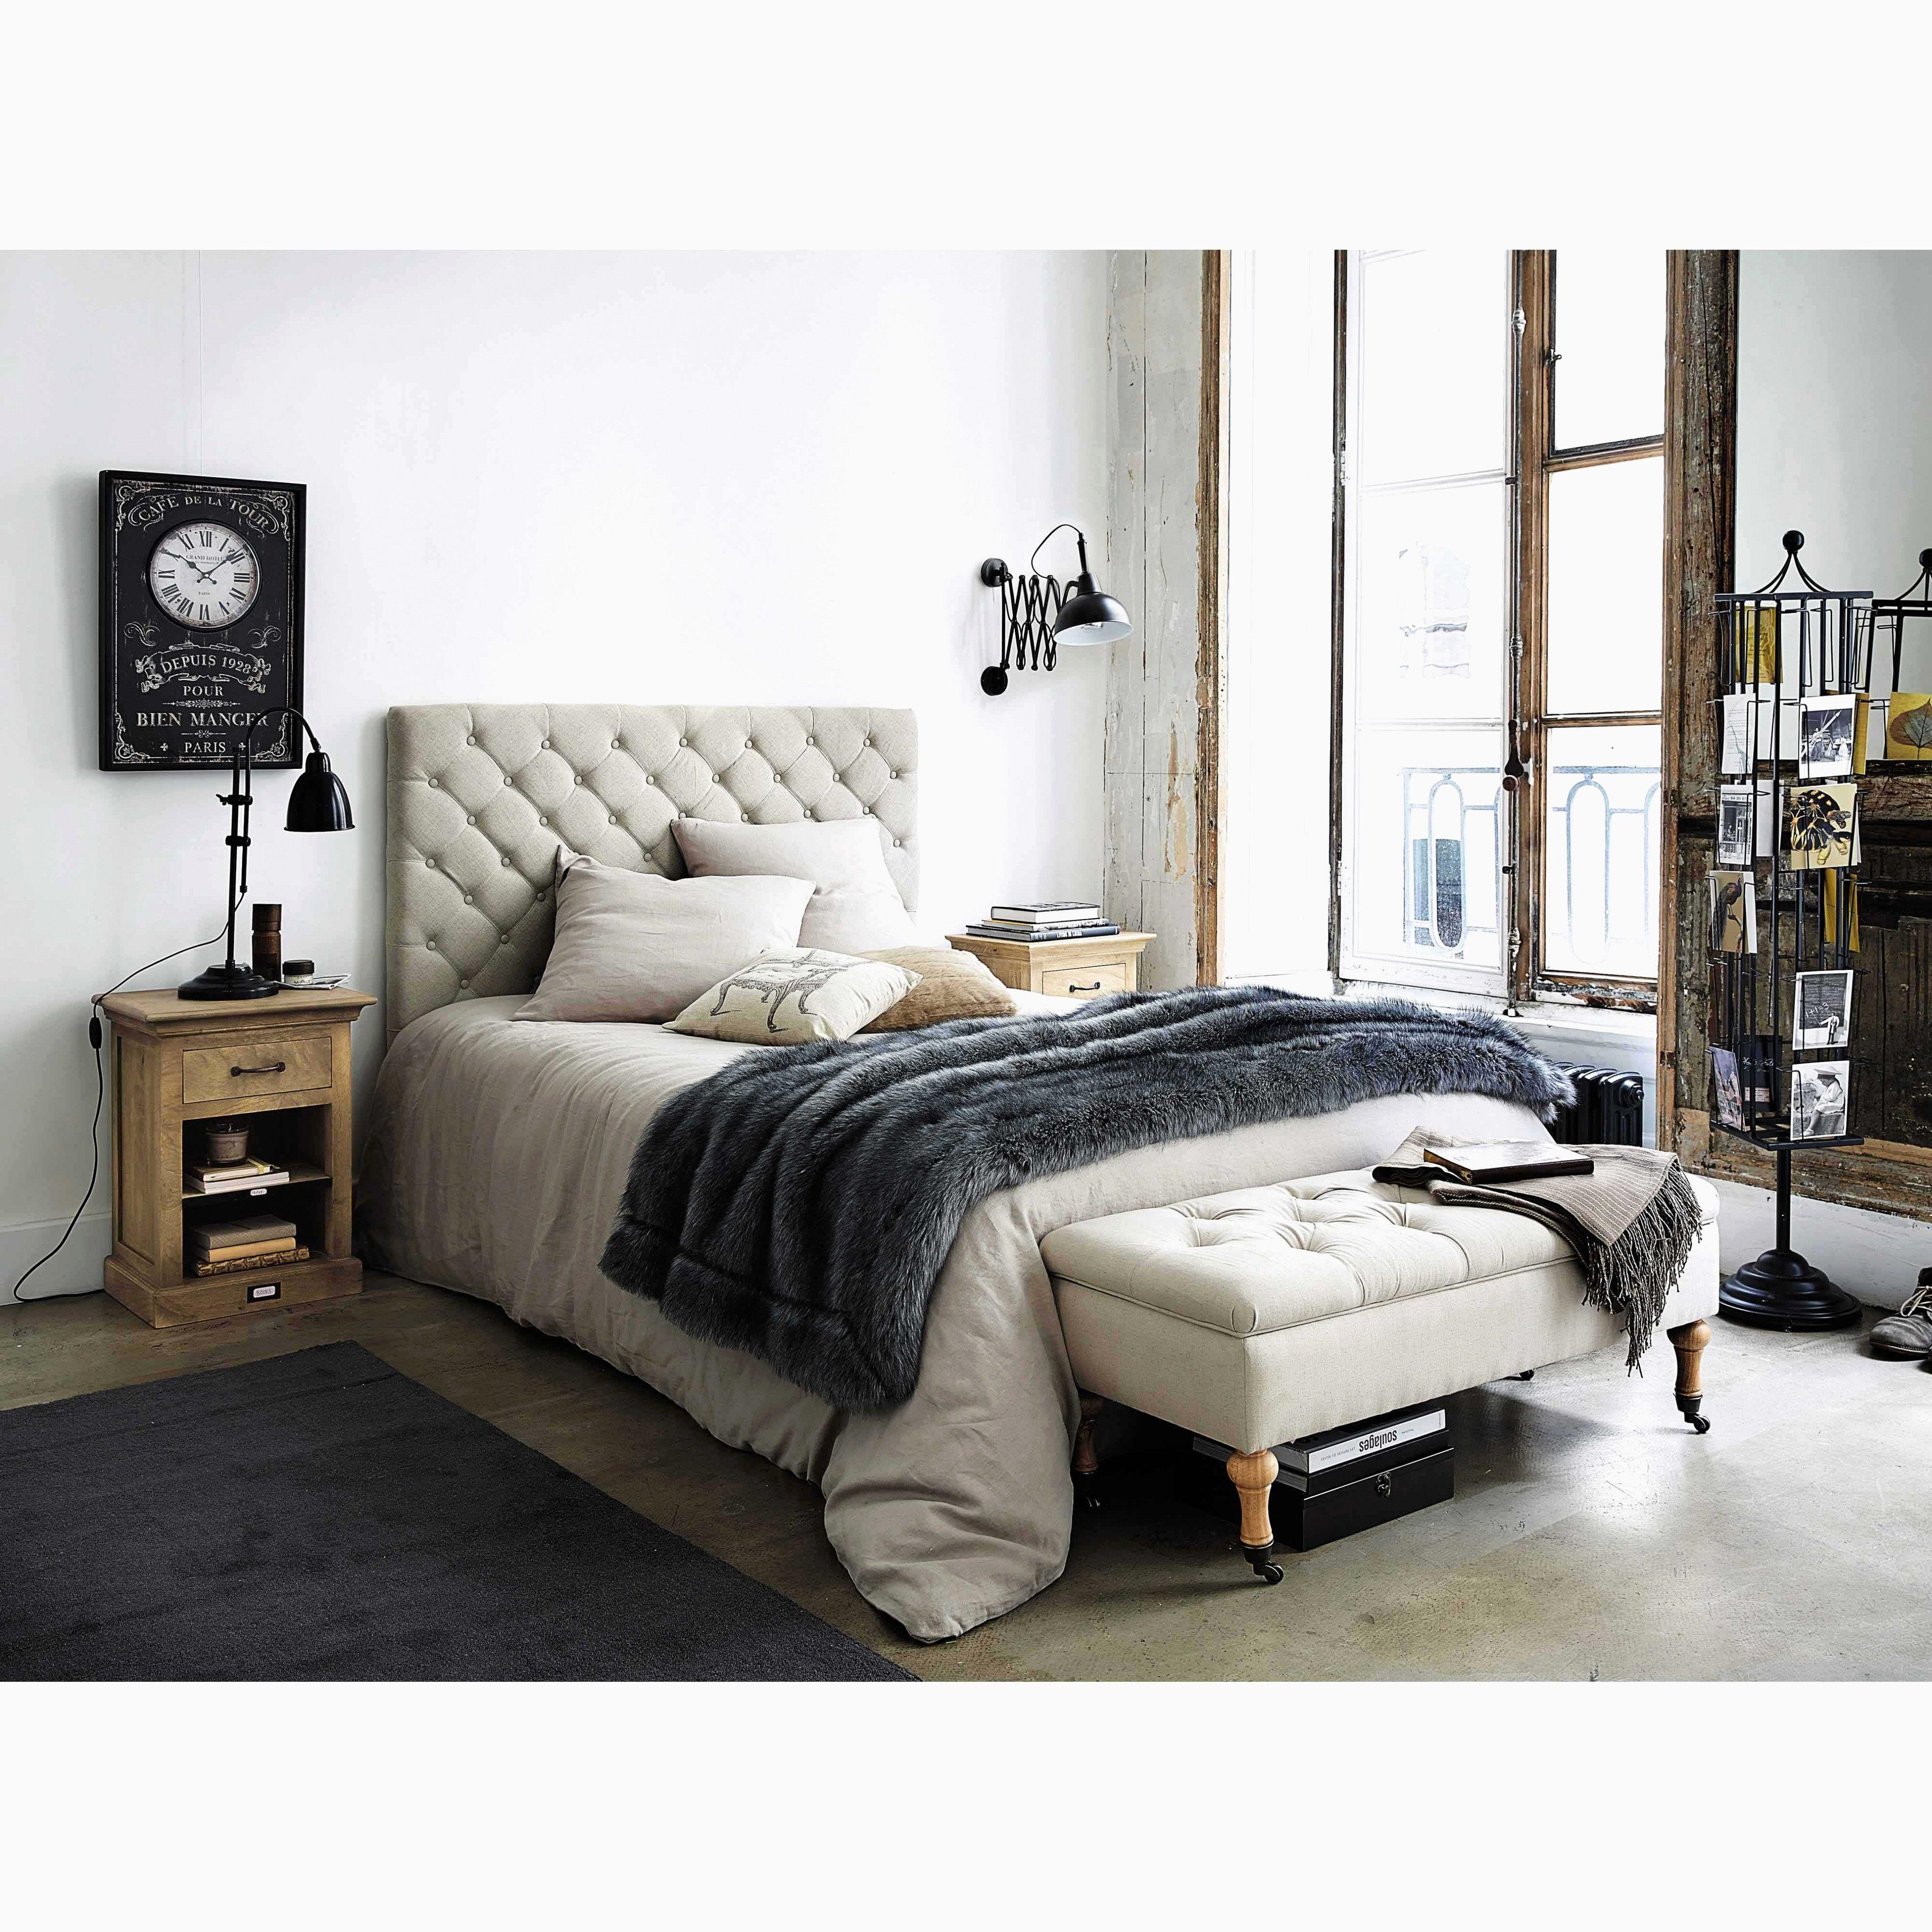 Tete De Lit 90 Beau Tete De Lit 90 Cm Tete De Lit Ikea 180 Fauteuil Salon Ikea Fresh